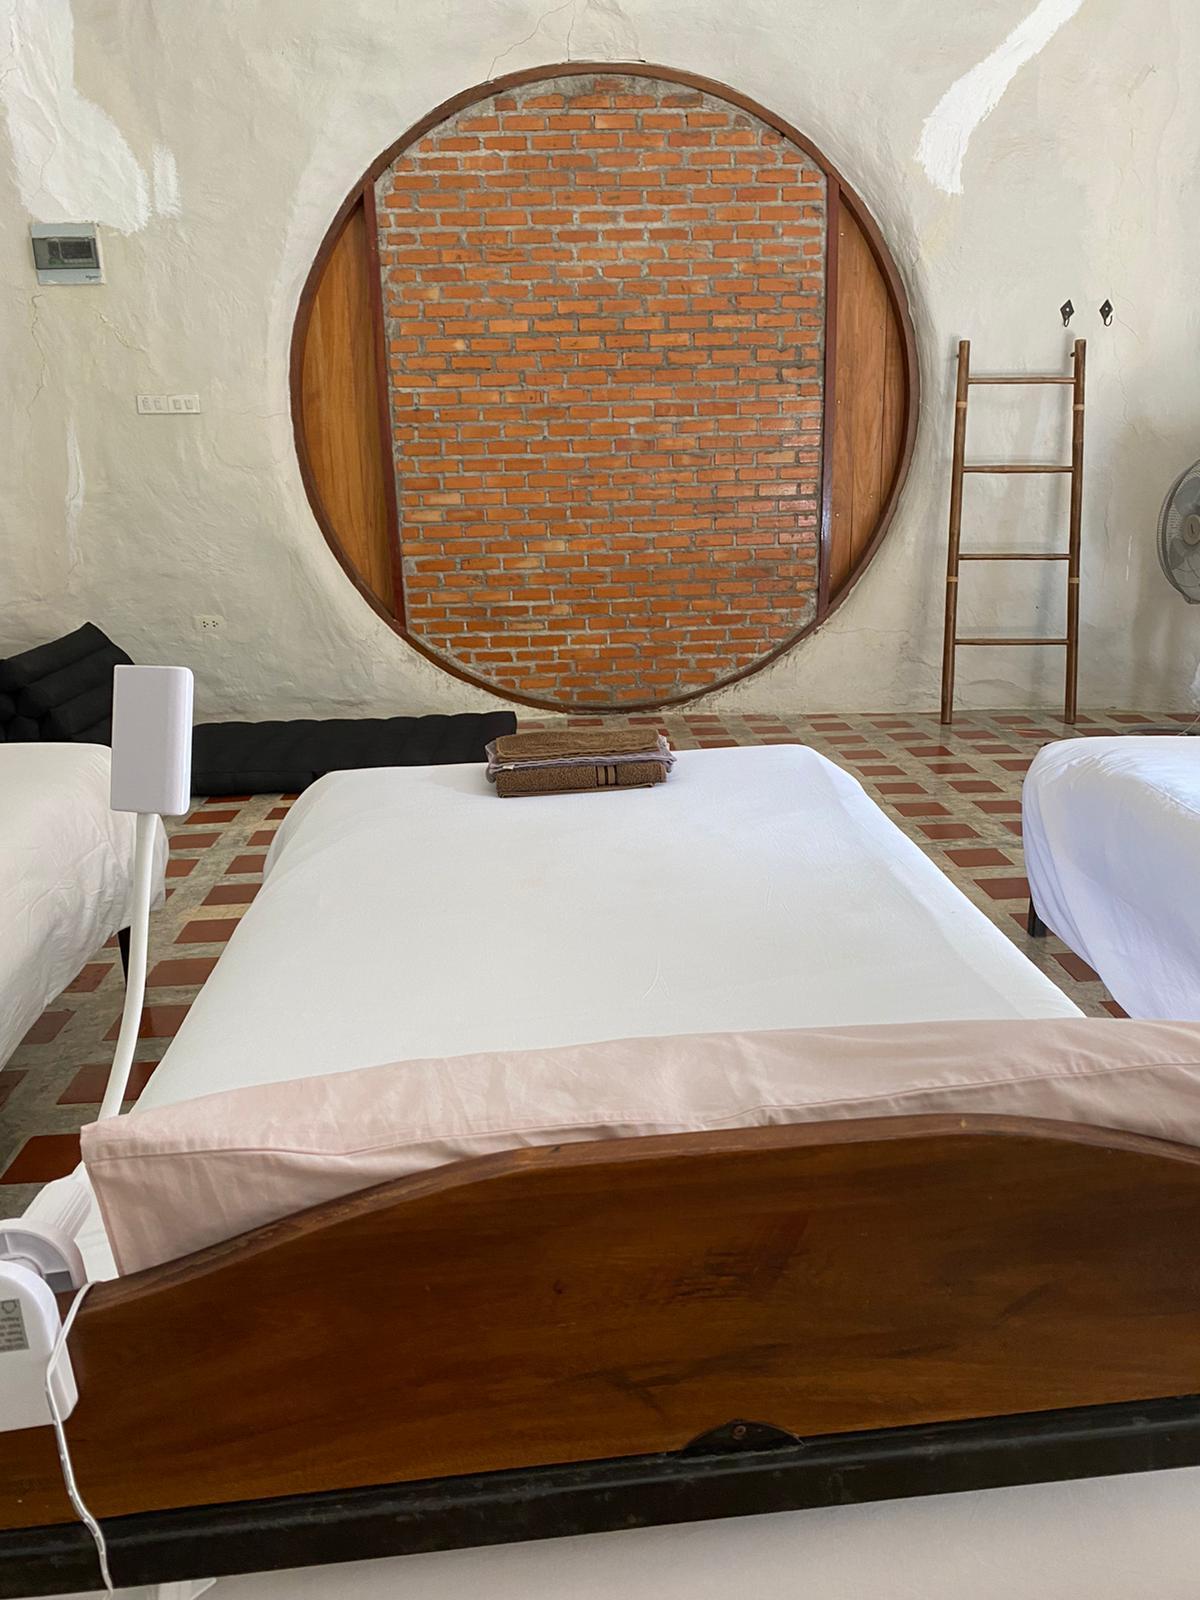 Bed in Adobe Villa Mala A Mala Dhara Chiang Mai